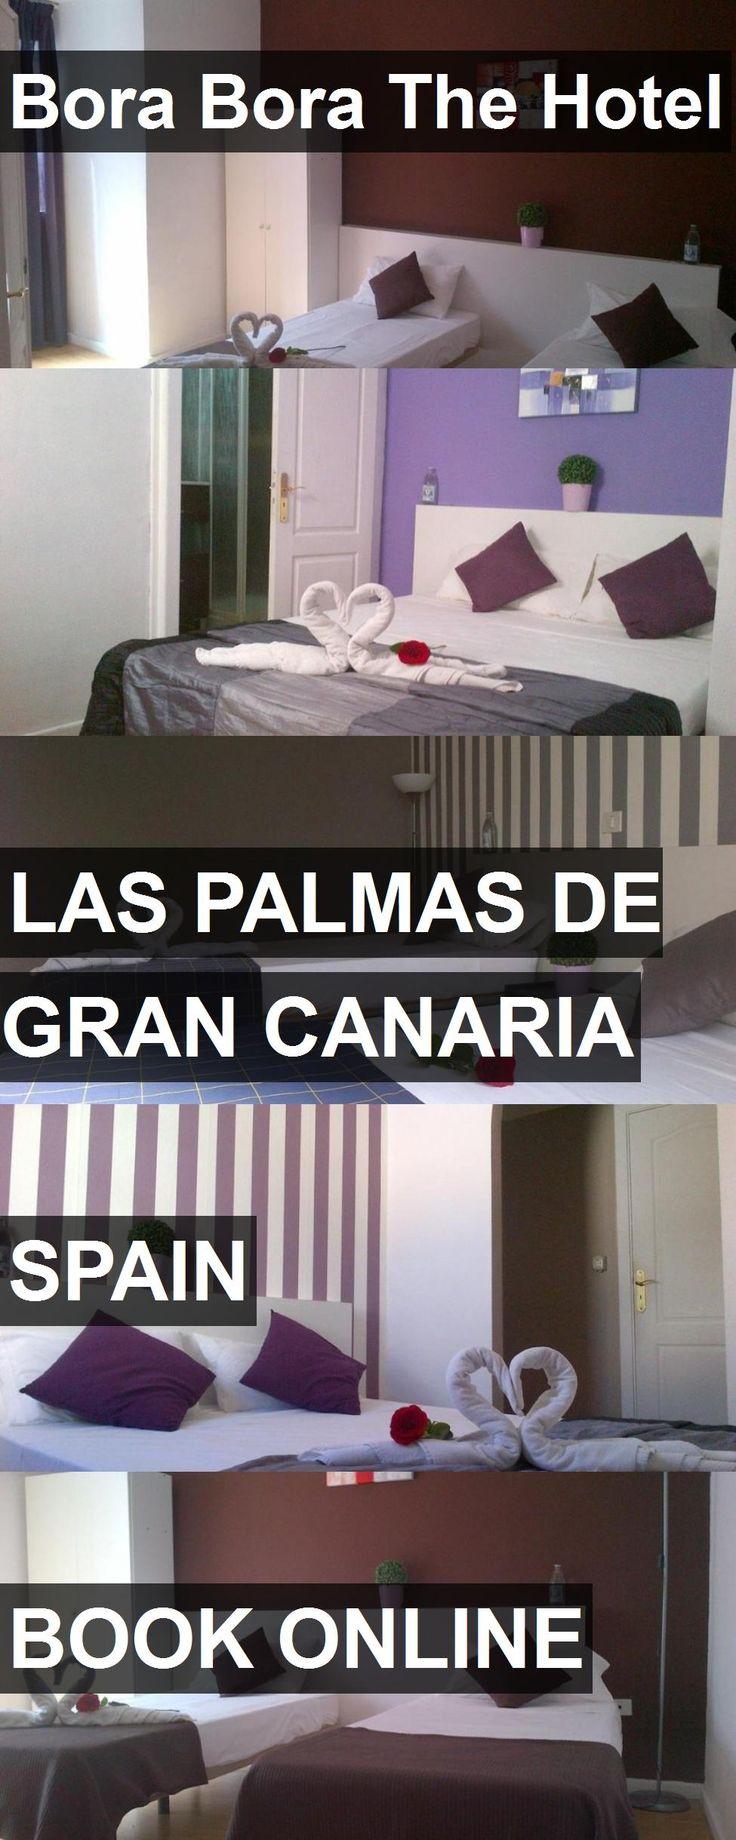 Bora Bora The Hotel in Las Palmas de Gran Canaria, Spain. For more information, photos, reviews and best prices please follow the link. #Spain #LasPalmasdeGranCanaria #travel #vacation #hotel